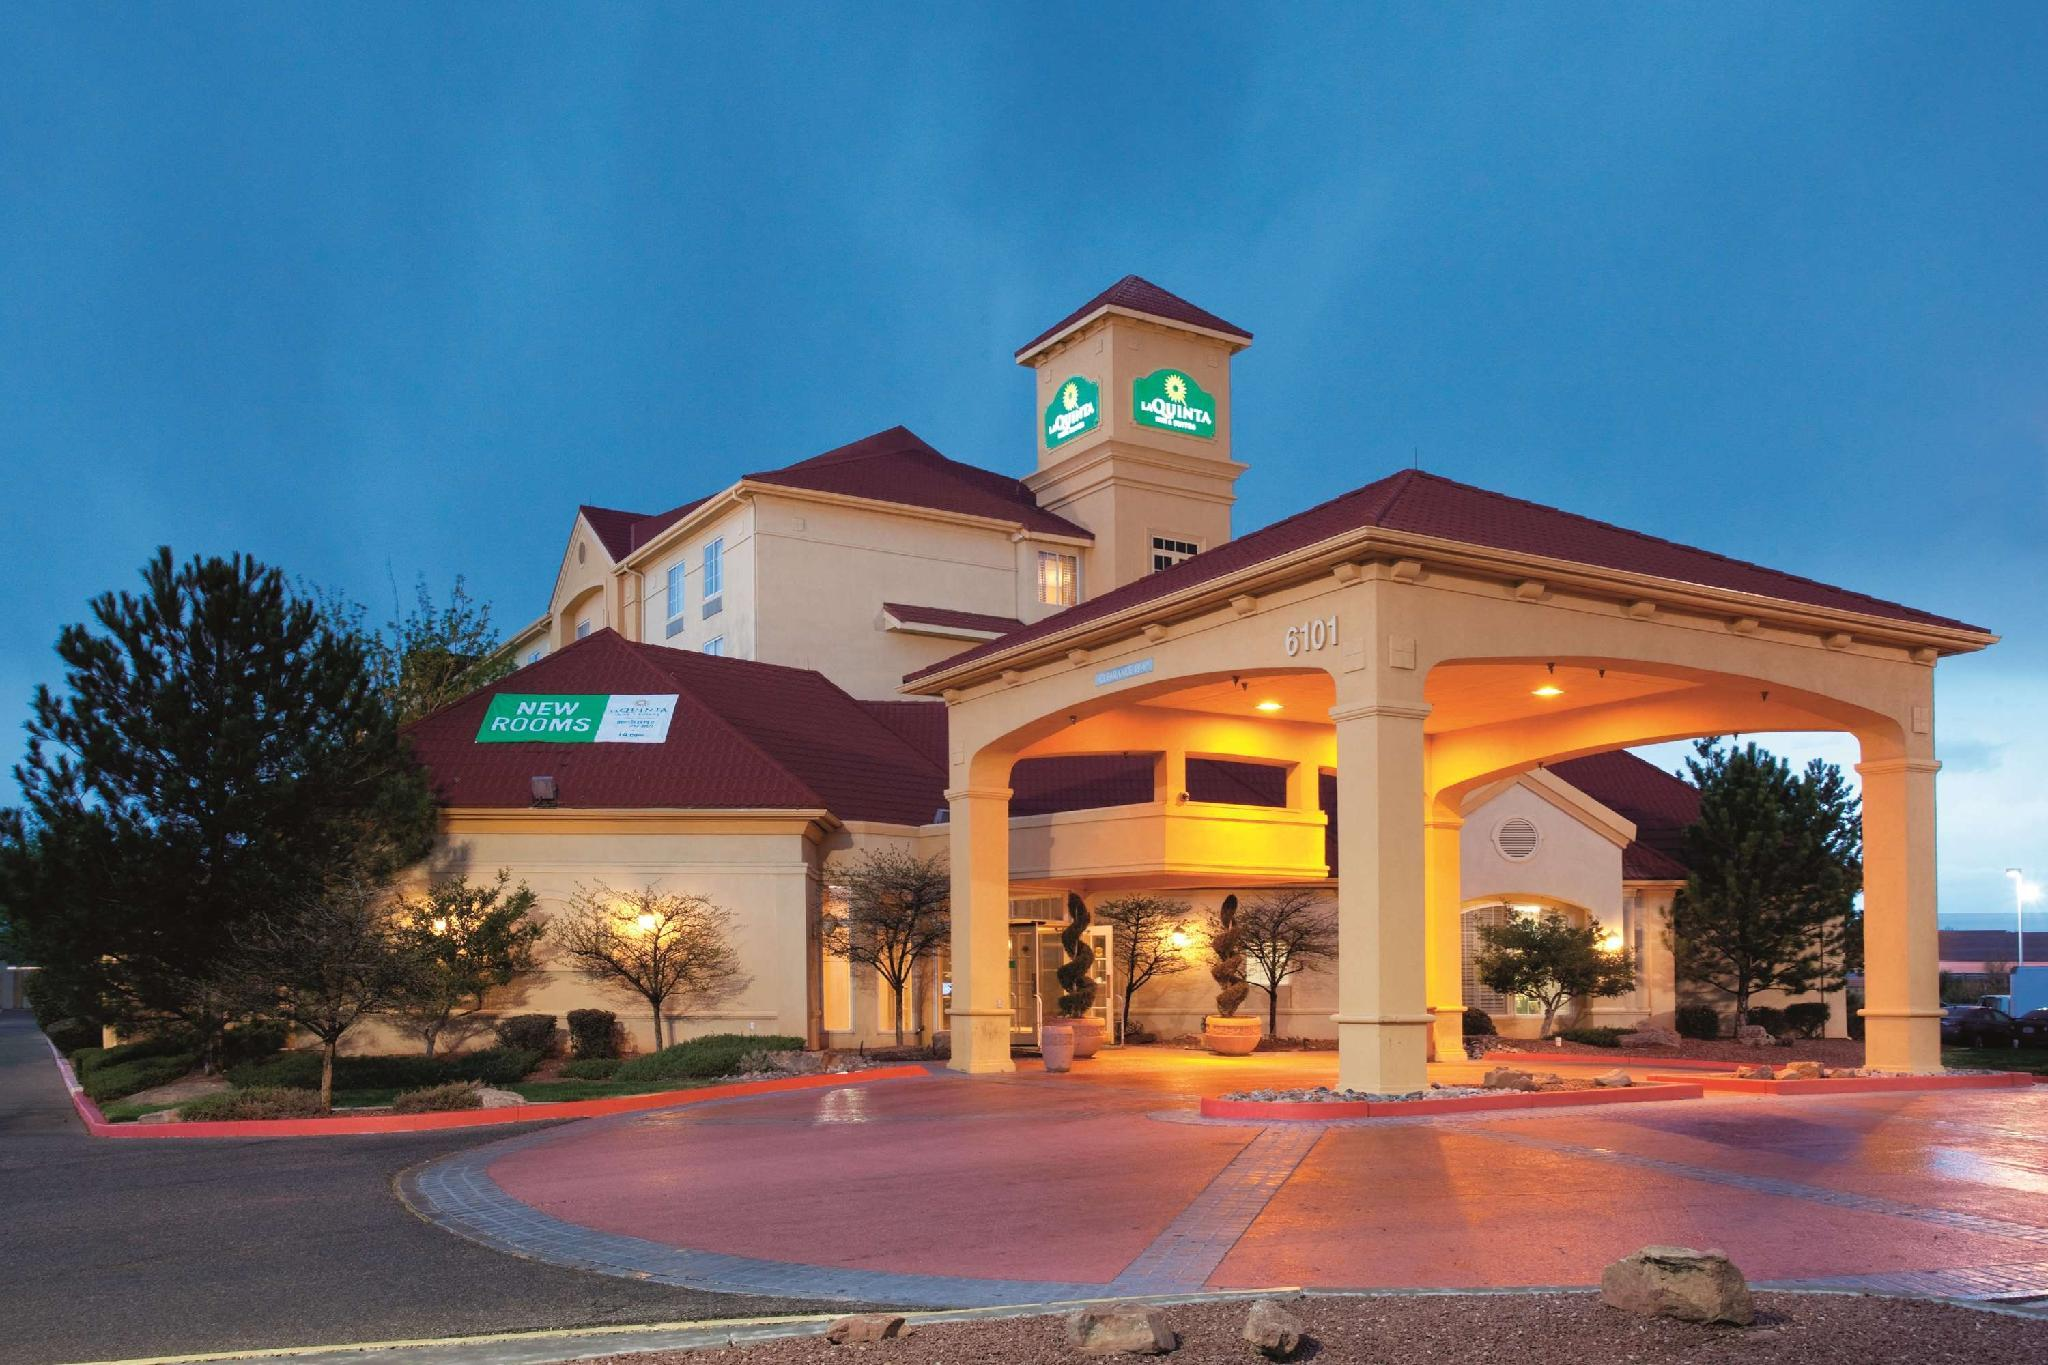 La Quinta Inn And Suites By Wyndham Albuquerque West